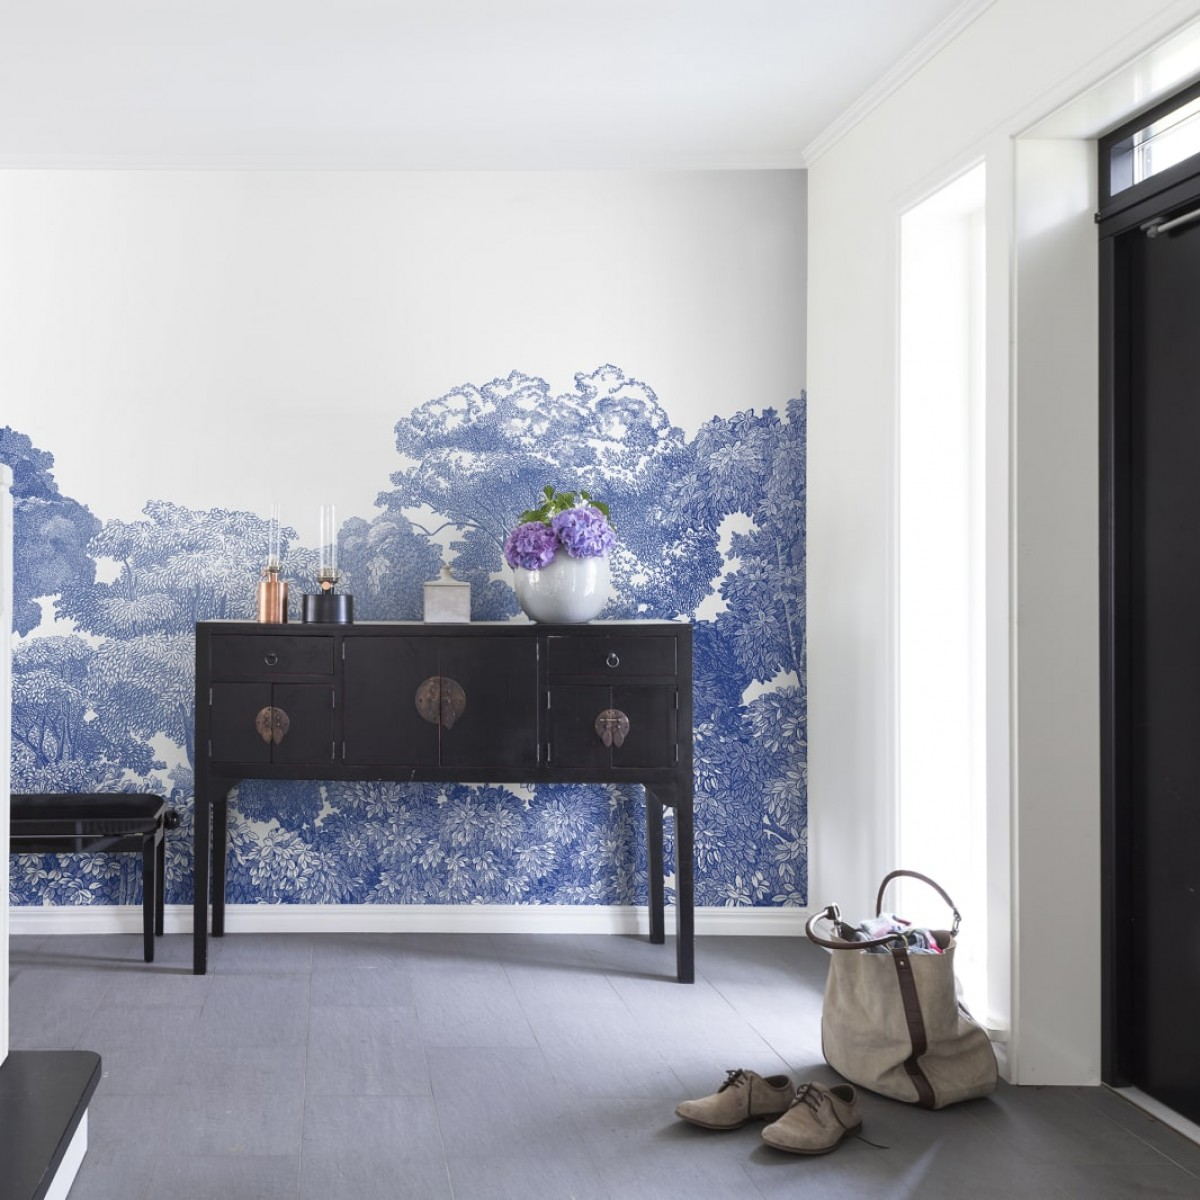 Foto tapet Bellewood, Porcelain Toile, personalizat, Rebel Walls